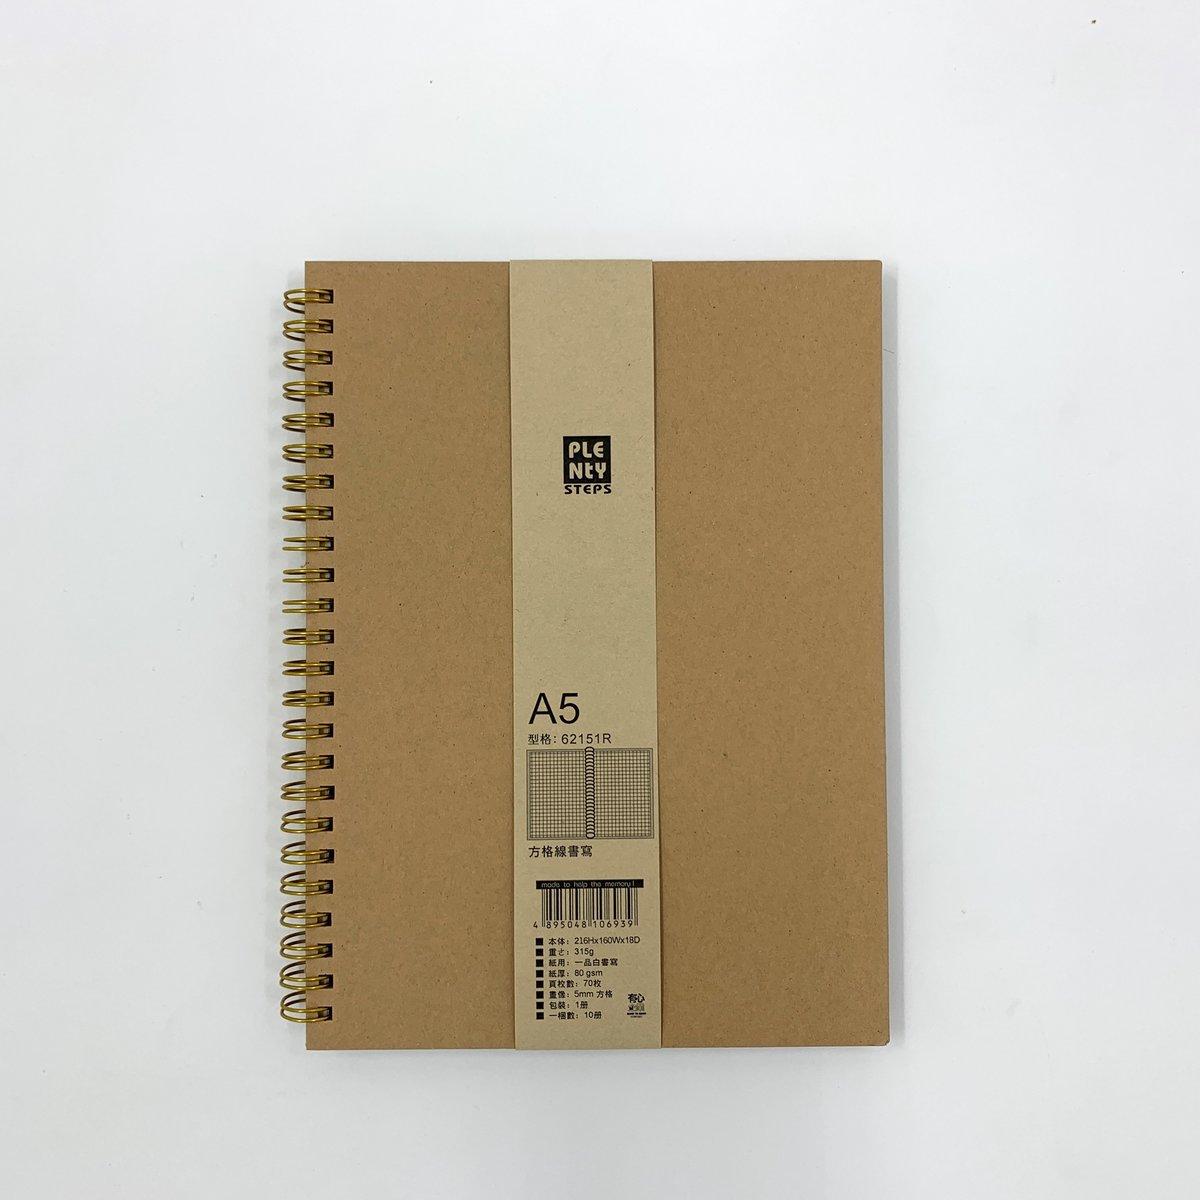 #62151R A5 Ultra-THICK Wire-O Checks Notebook